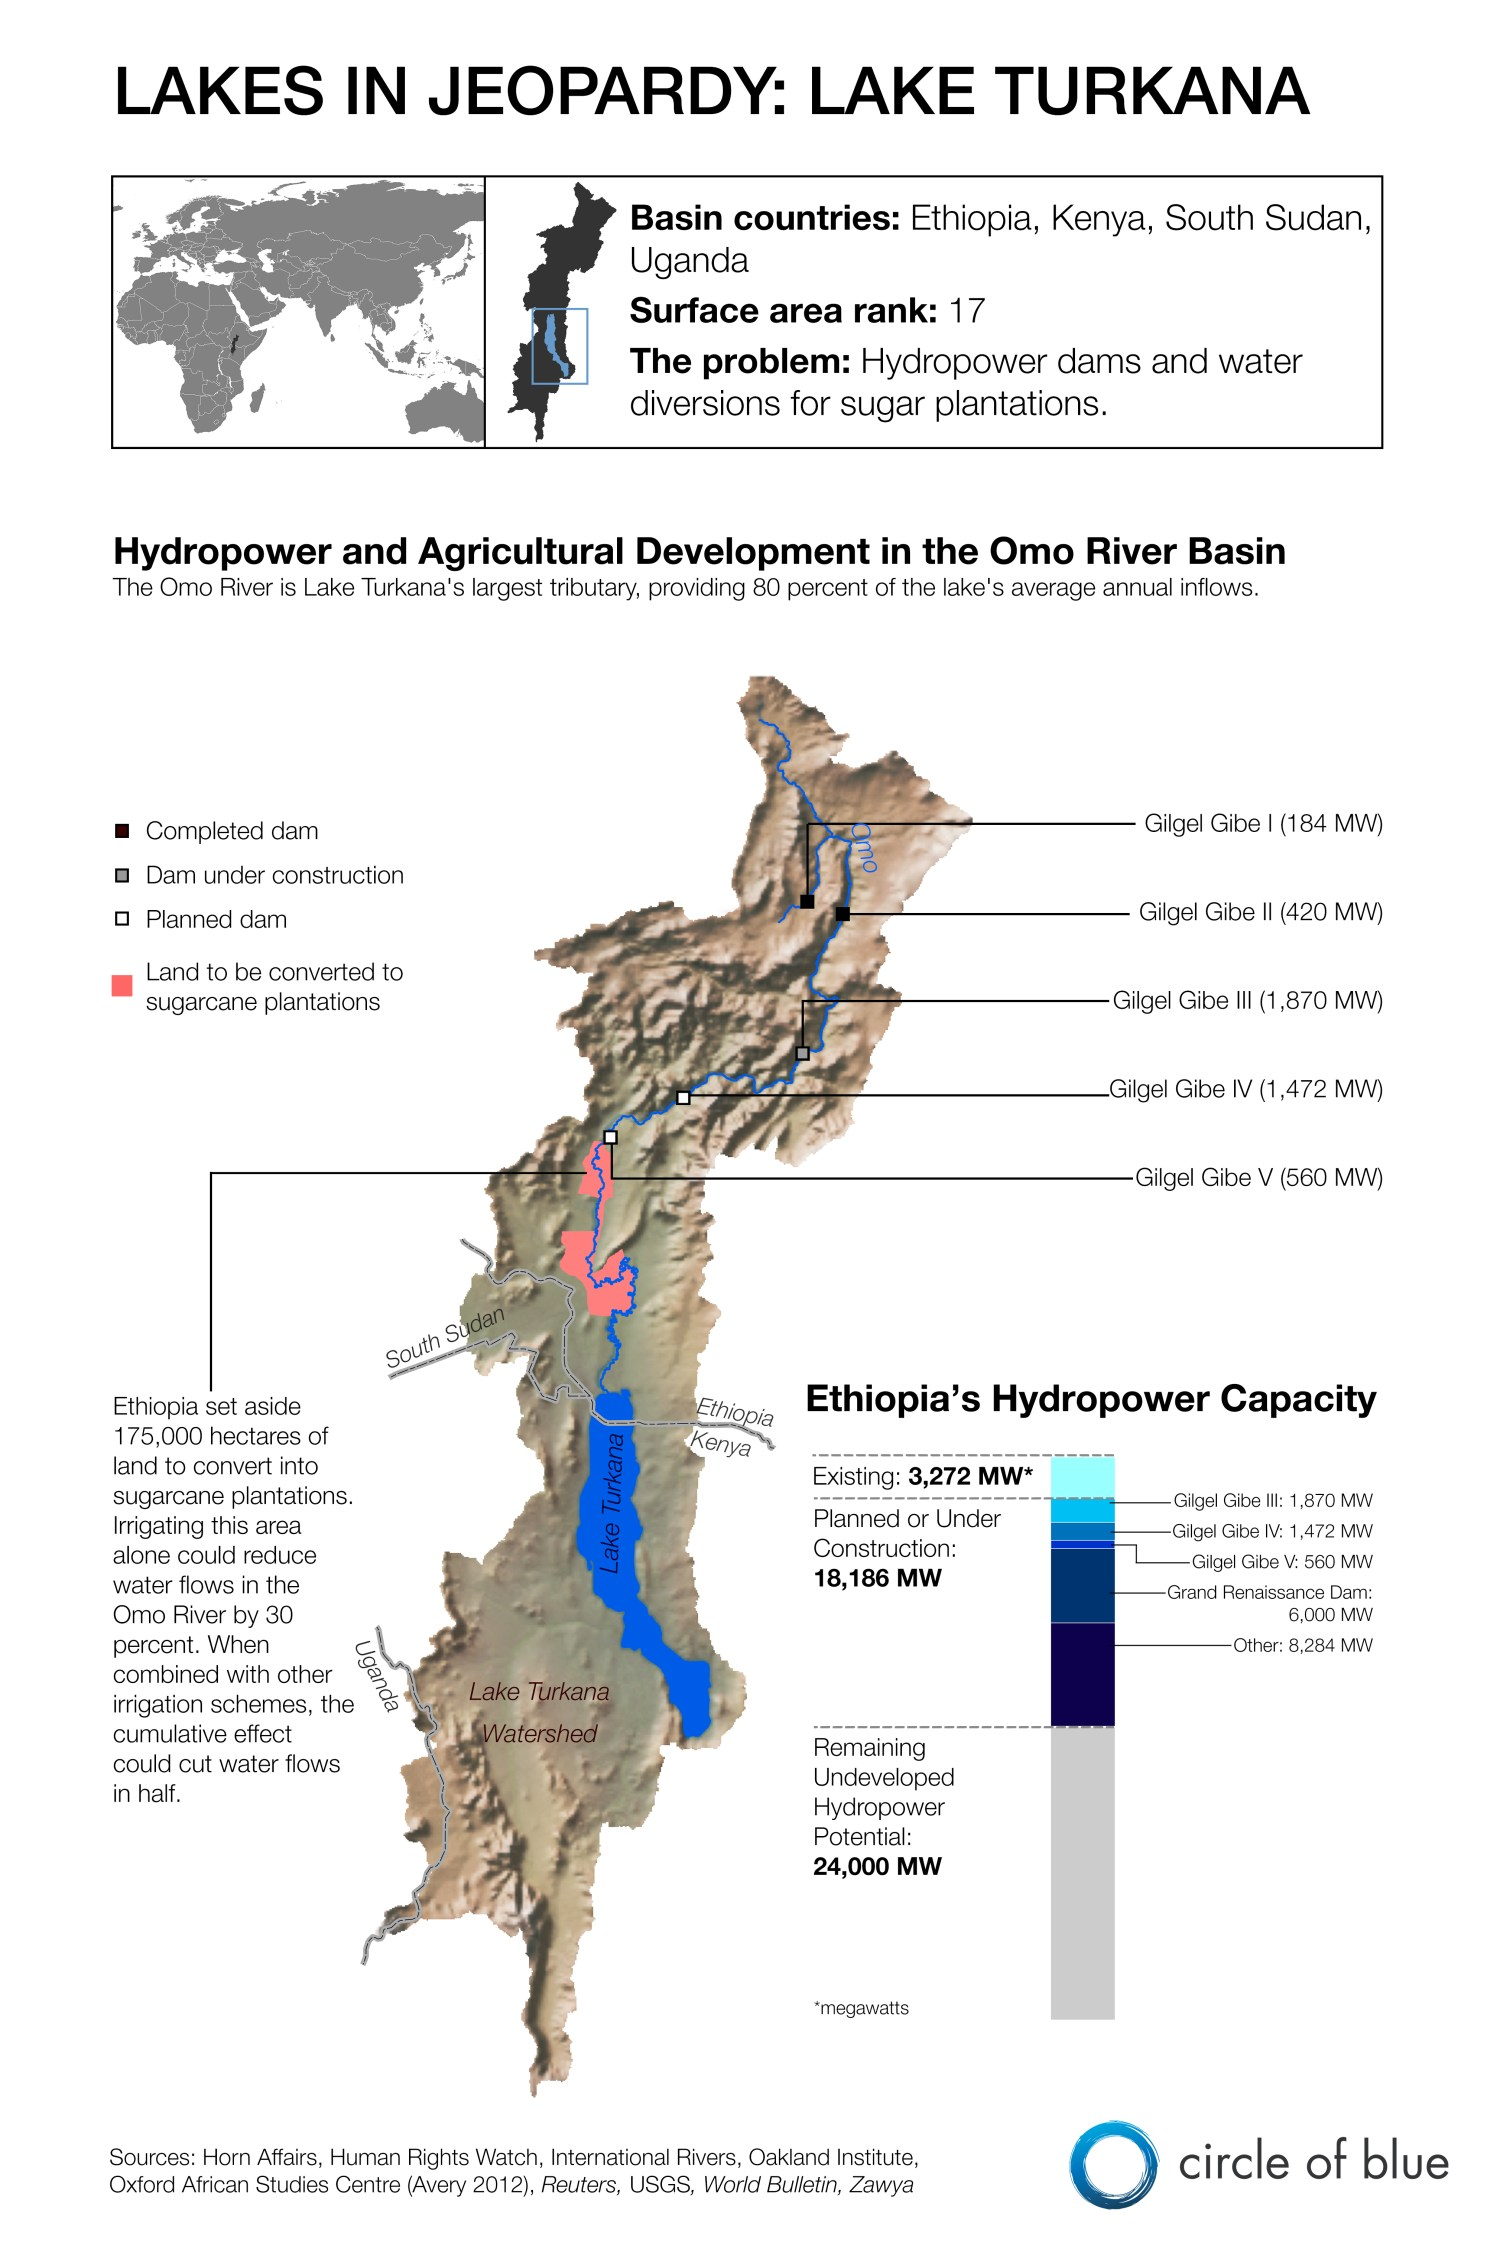 Infographic Graphic Map Lake Turkana Africa Lakes In Jeopardy water Omo River Ethiopia Kenya South Sudan Uganda hydropower irrigation sugar plantation Kaye LaFond Circle of Blue